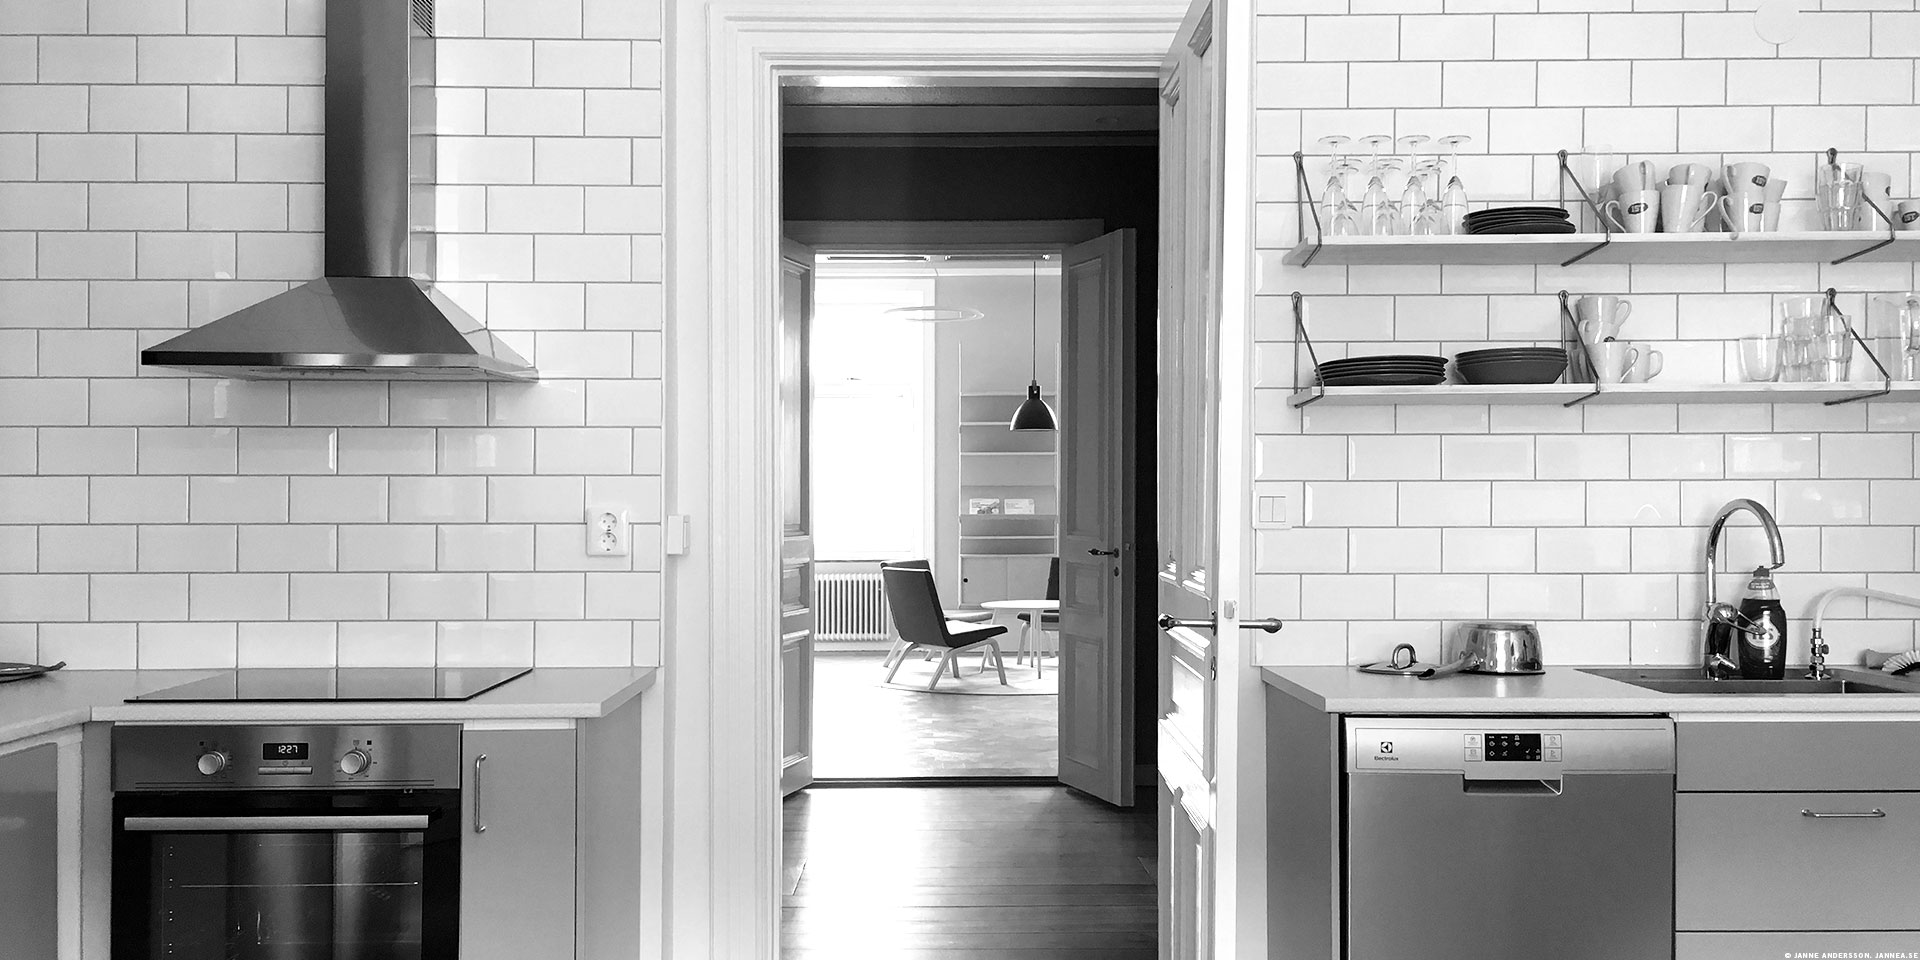 Köket på jobbet |© Janne A